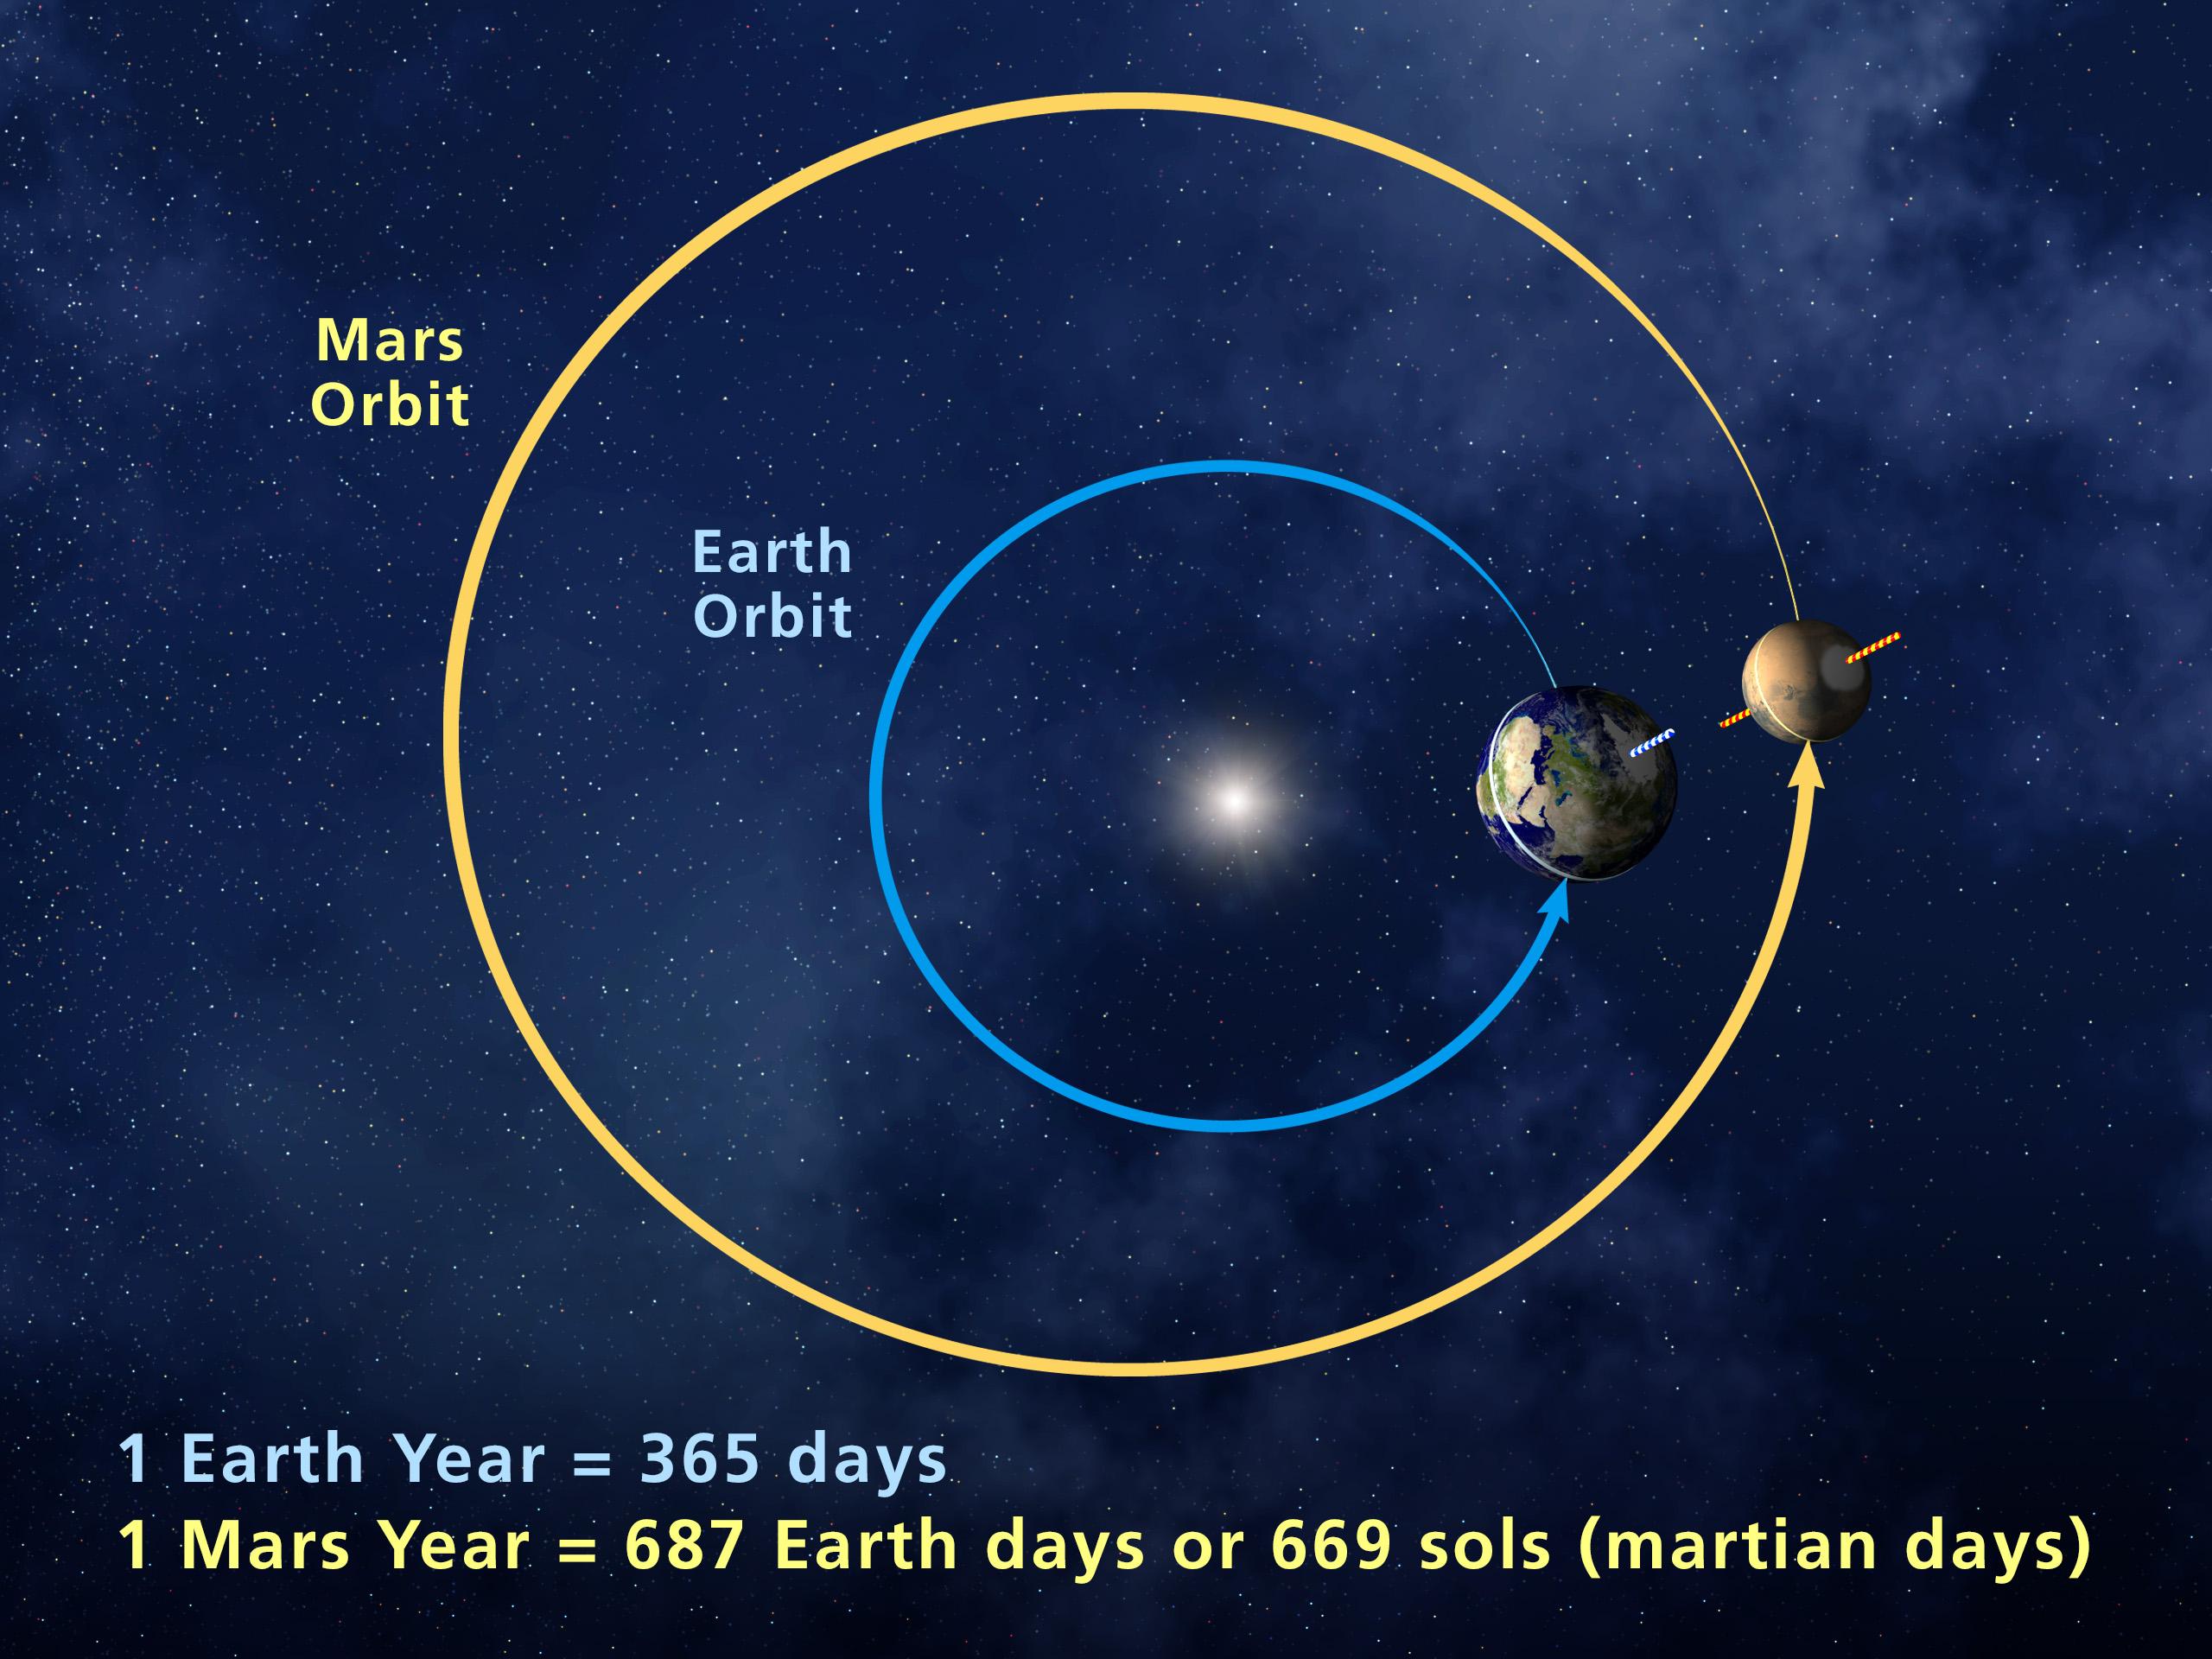 Martian Year   Mars Exploration Program